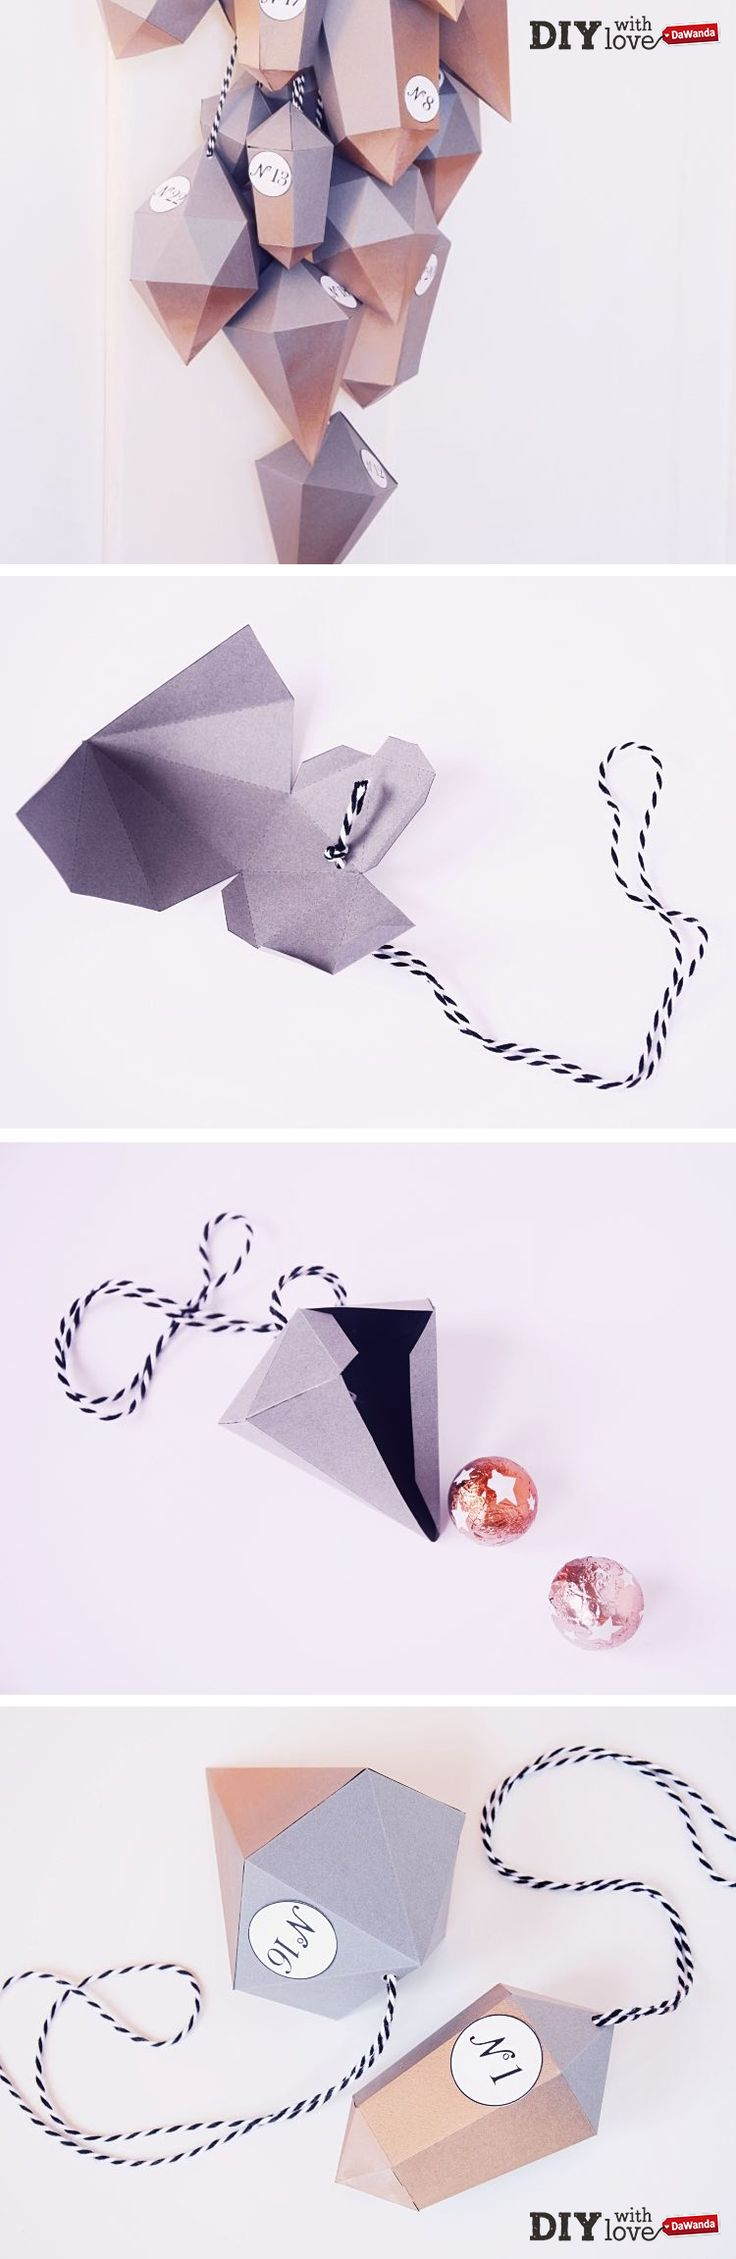 Oltre 10 fantastiche idee su calendari stampabili su - Modelli di ghirlanda stampabili ...